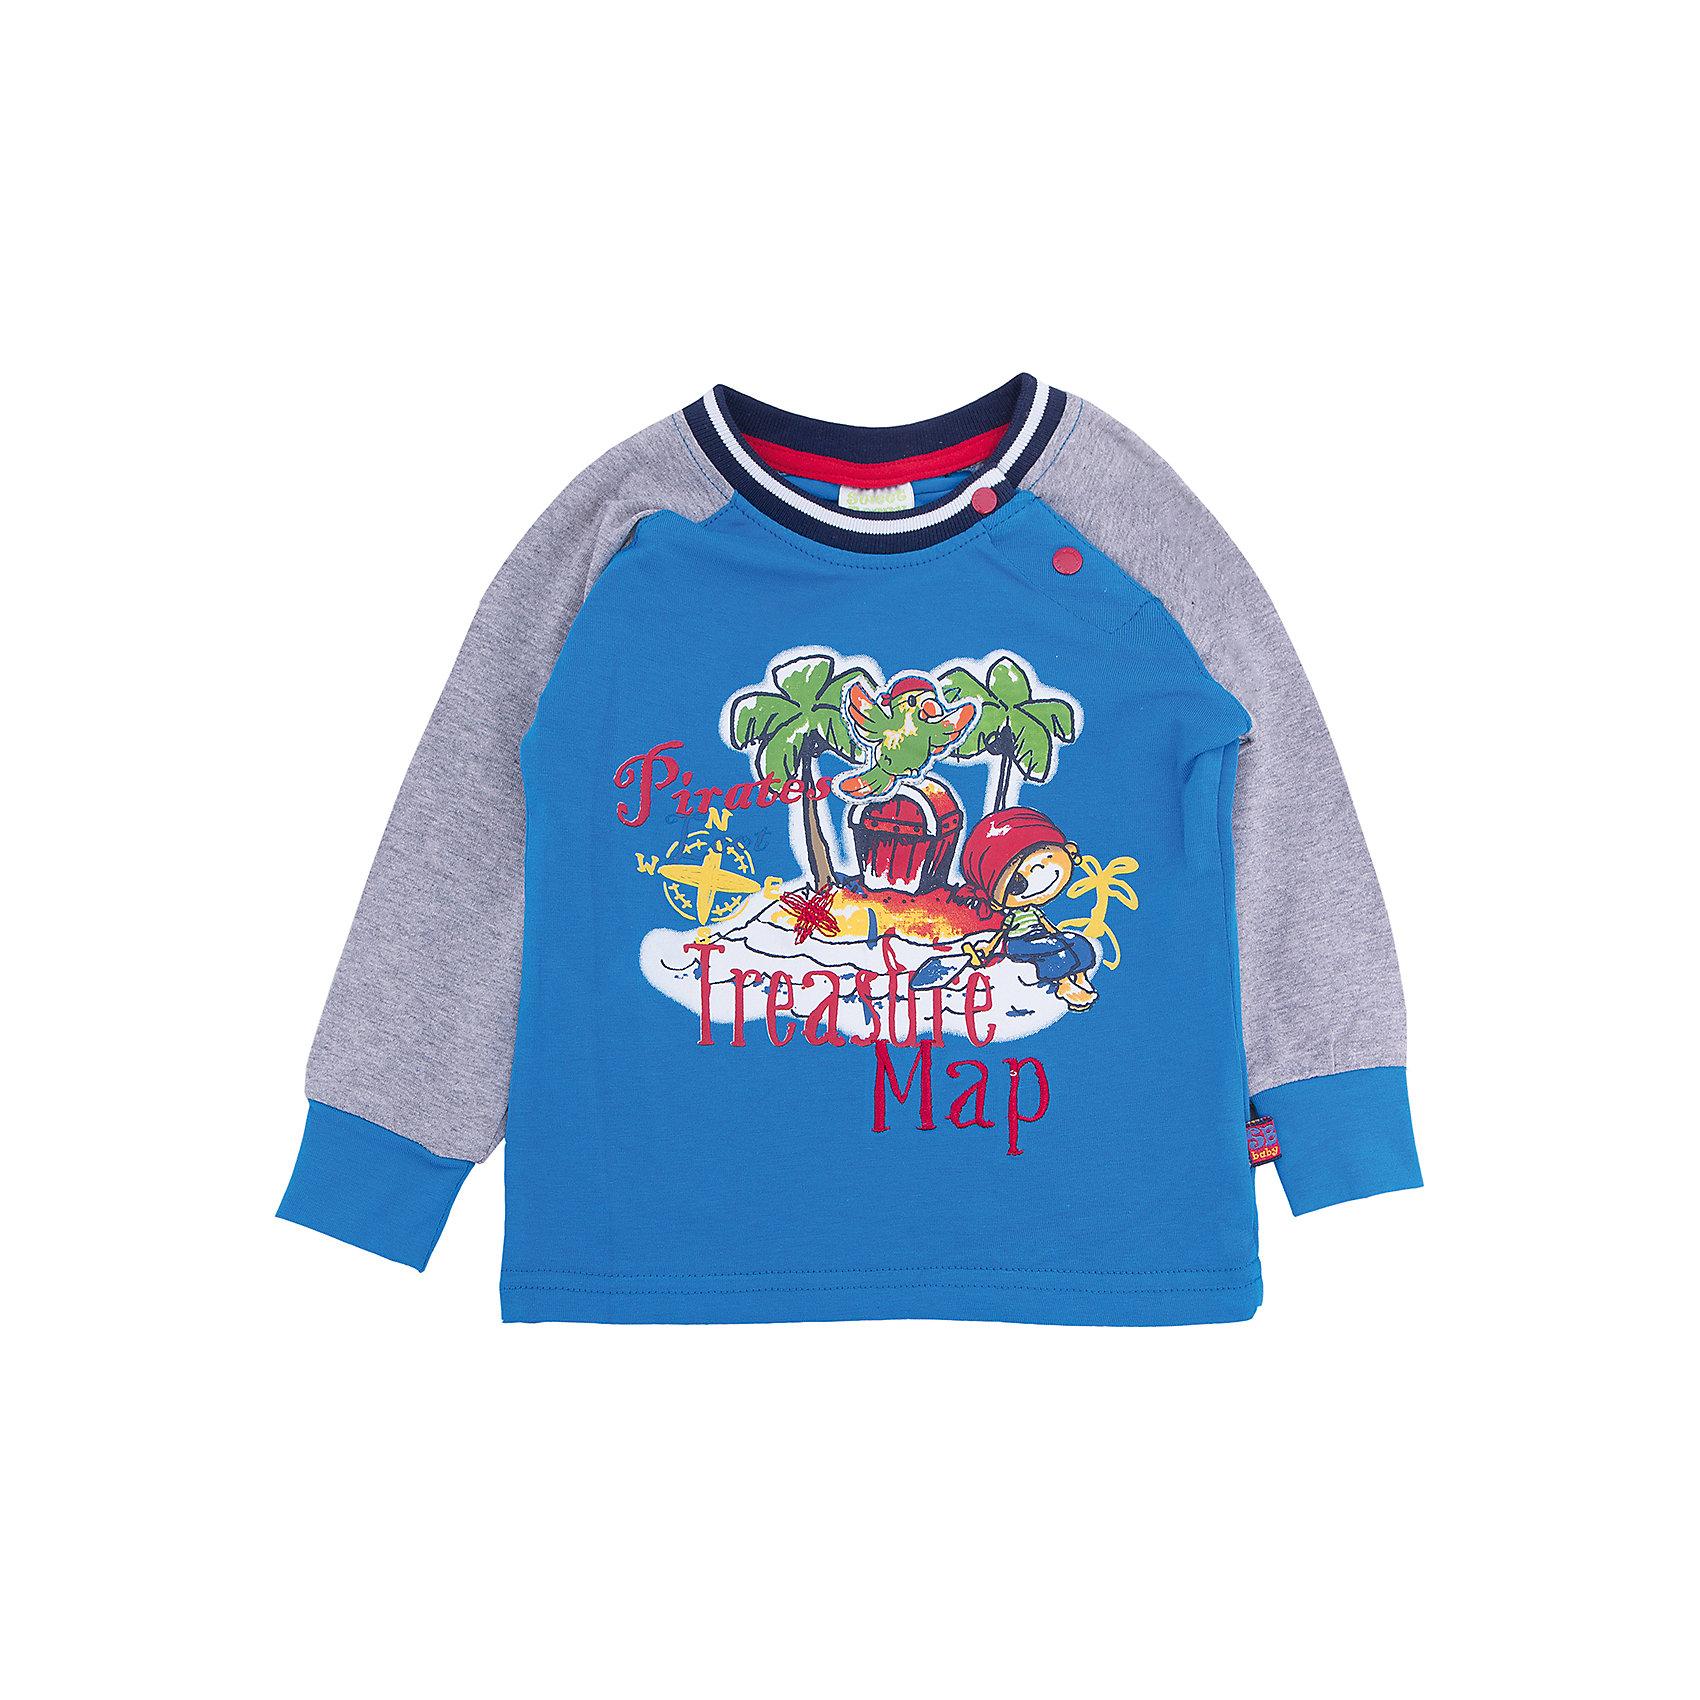 Sweet Berry Футболка с длинным рукавом для мальчика Sweet Berry футболка с длинным рукавом для мальчика barkito трактор красная